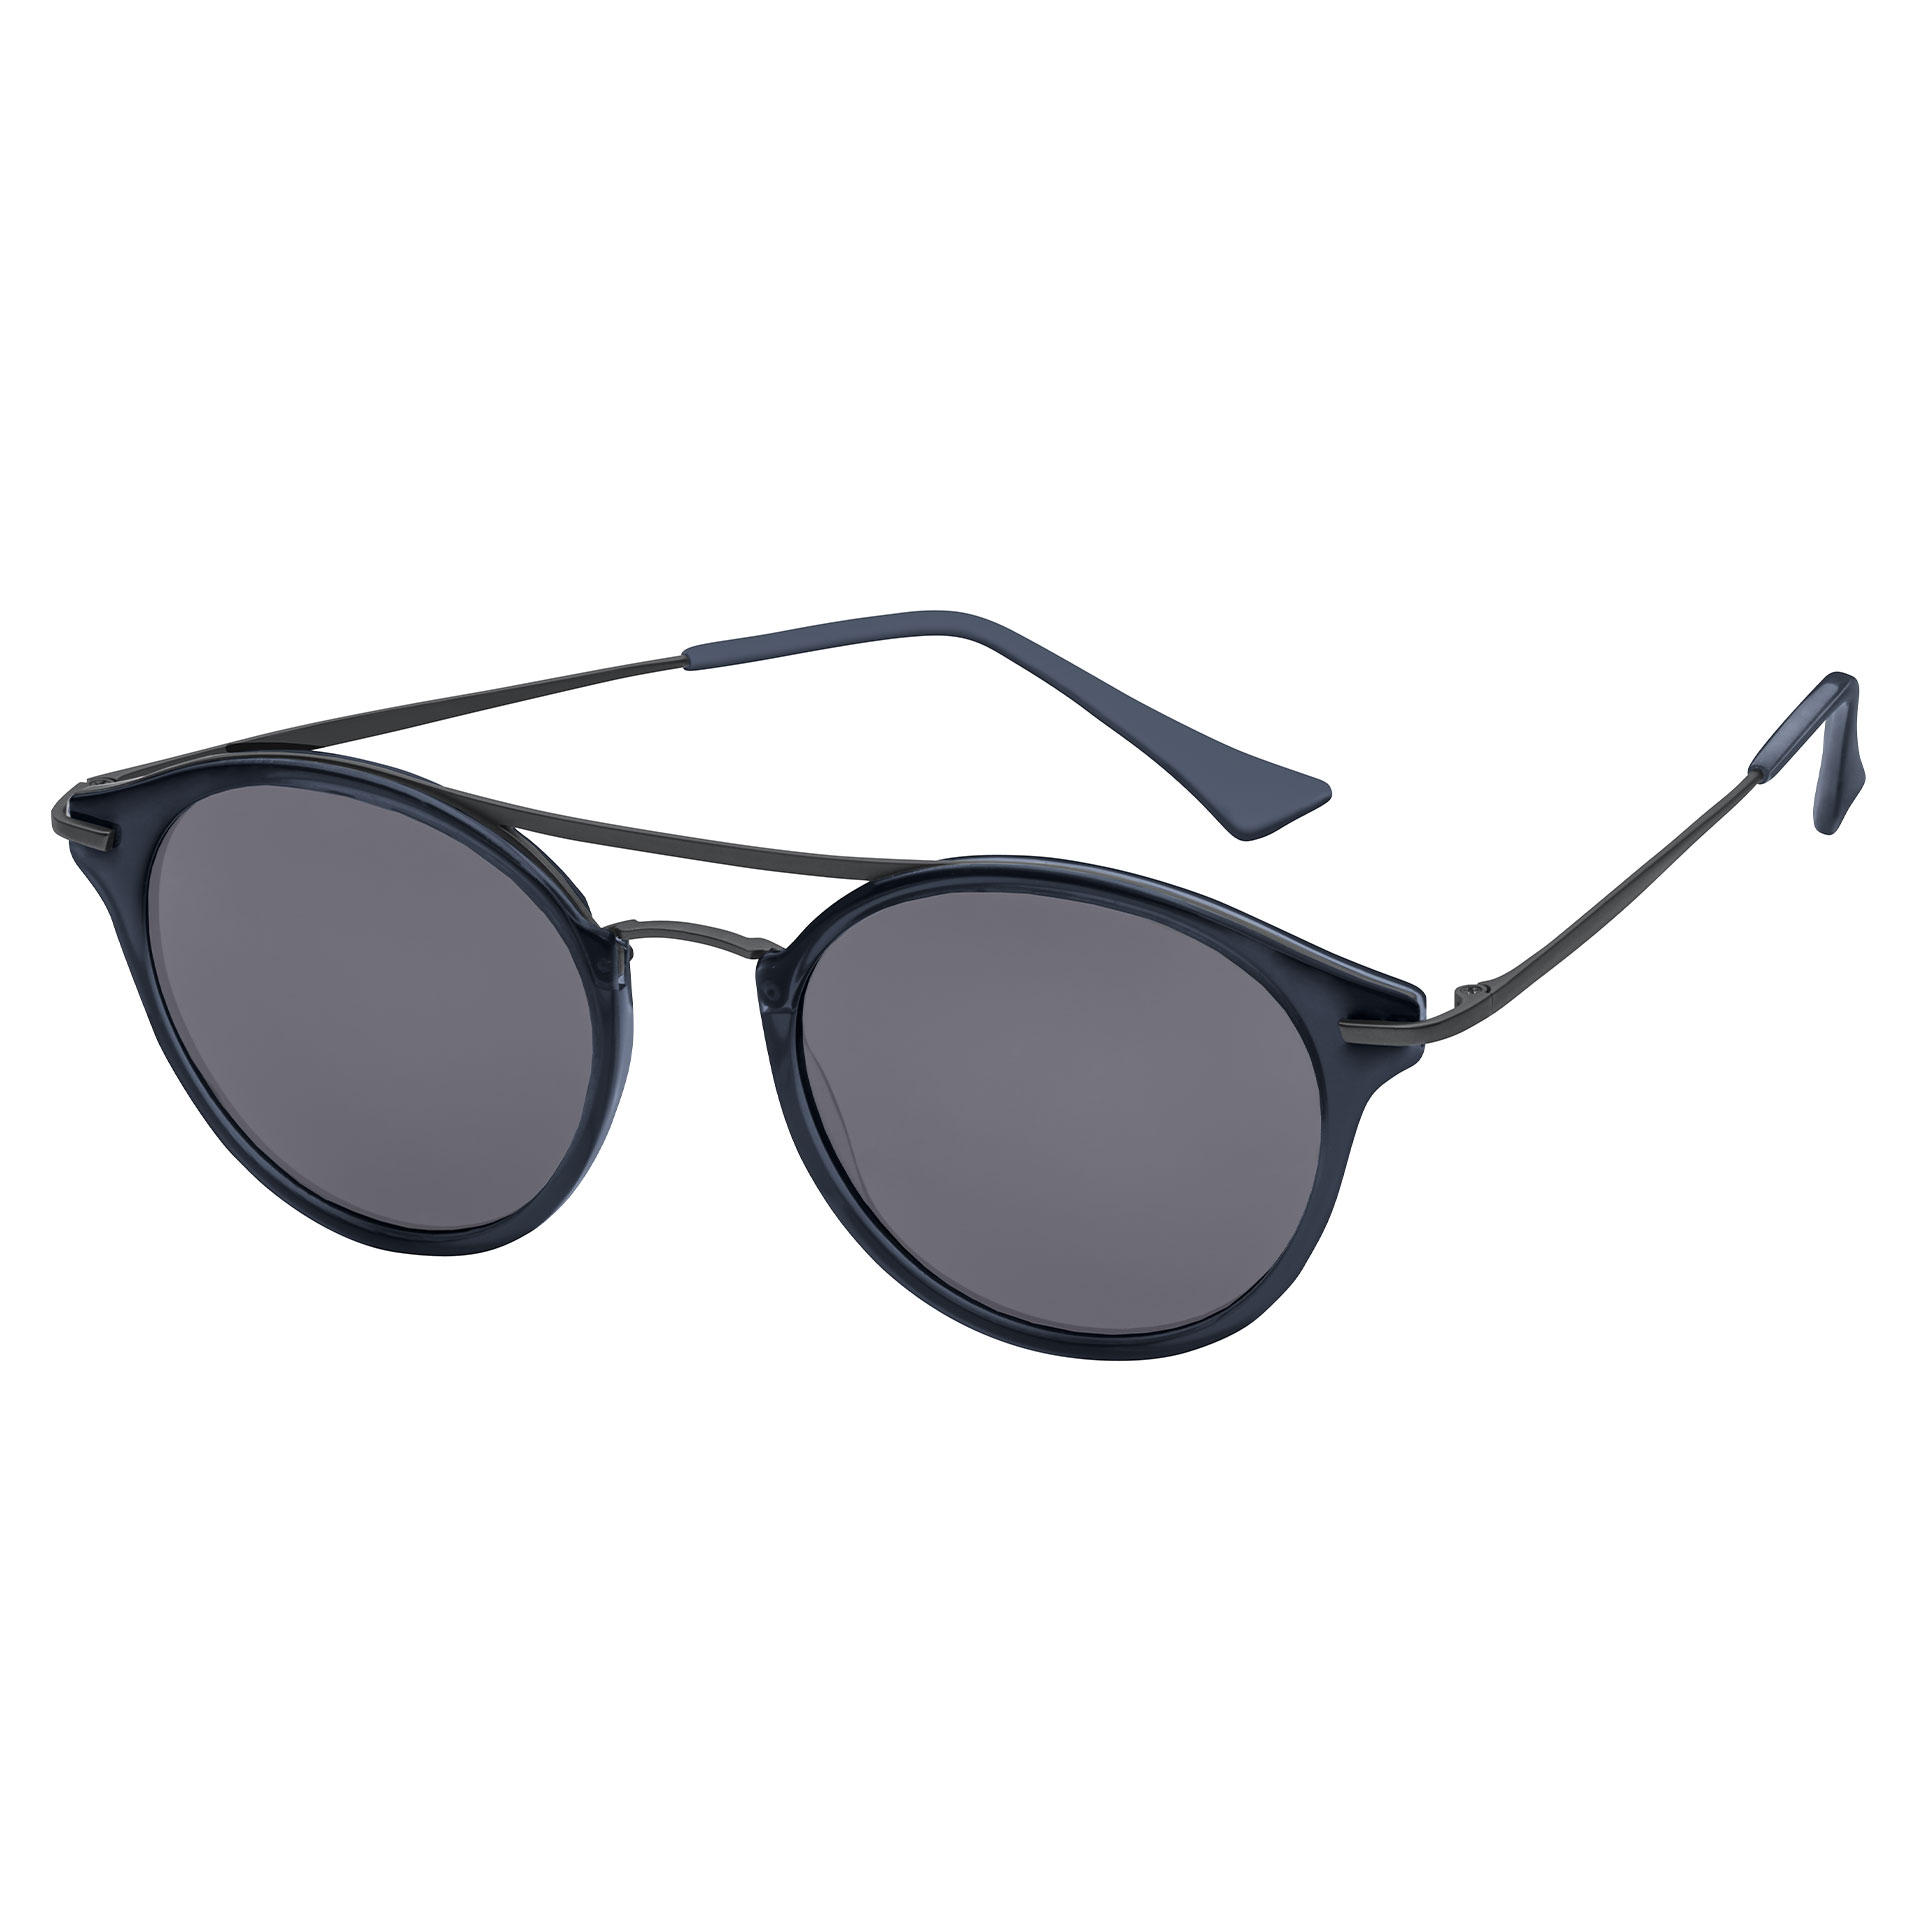 Mercedes-Benz Sonnenbrille Herren Casual